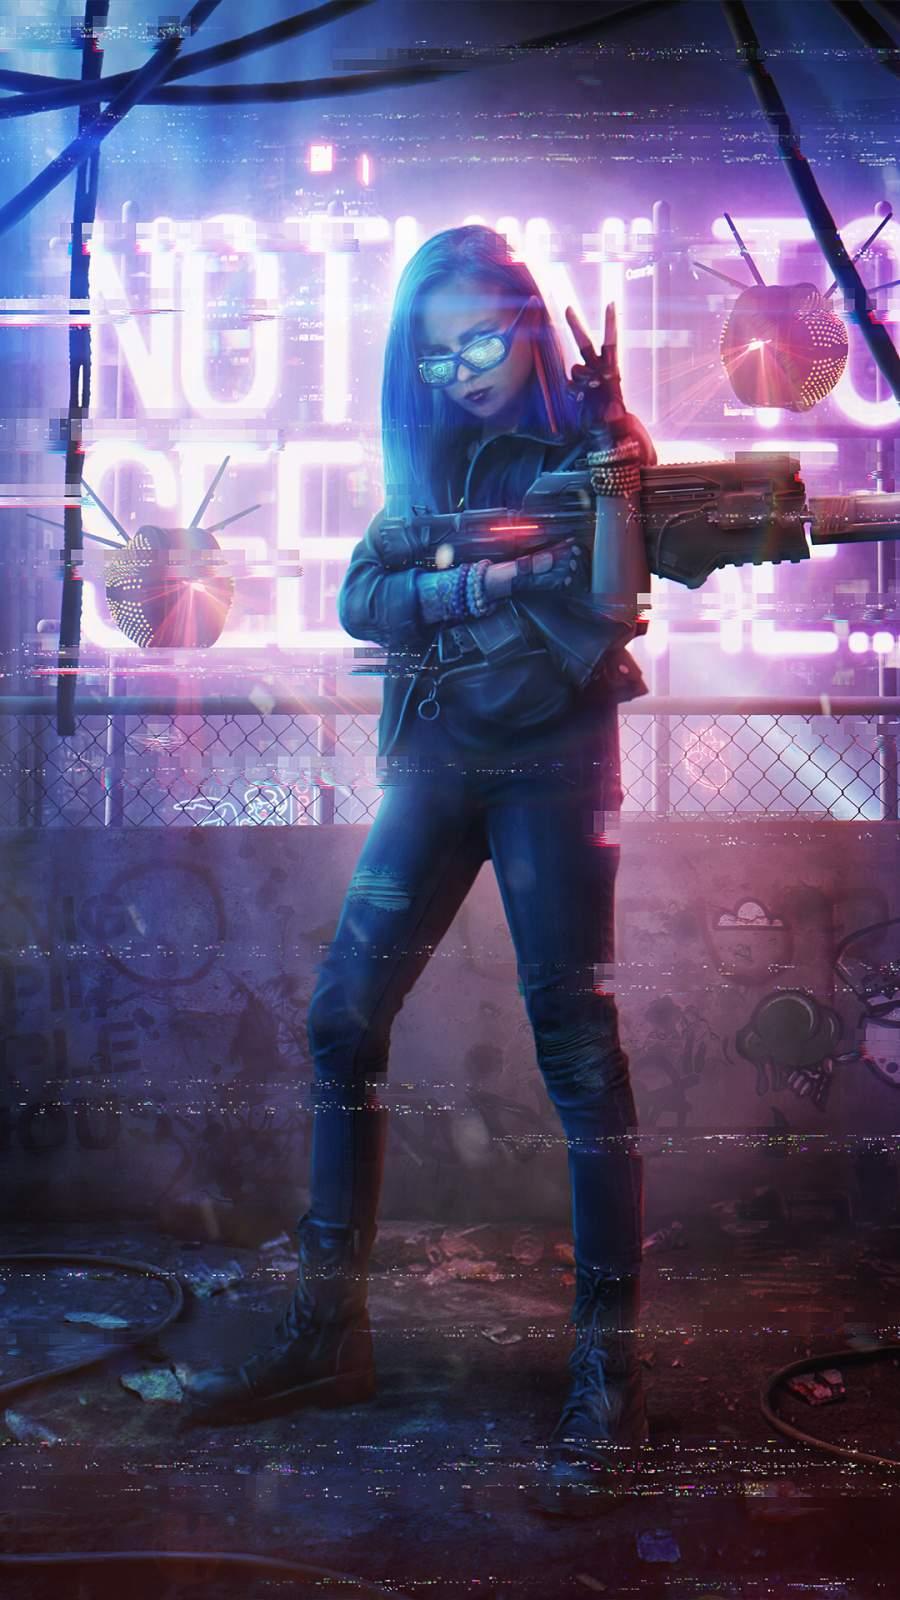 Neon Girl with Gun iPhone Wallpaper